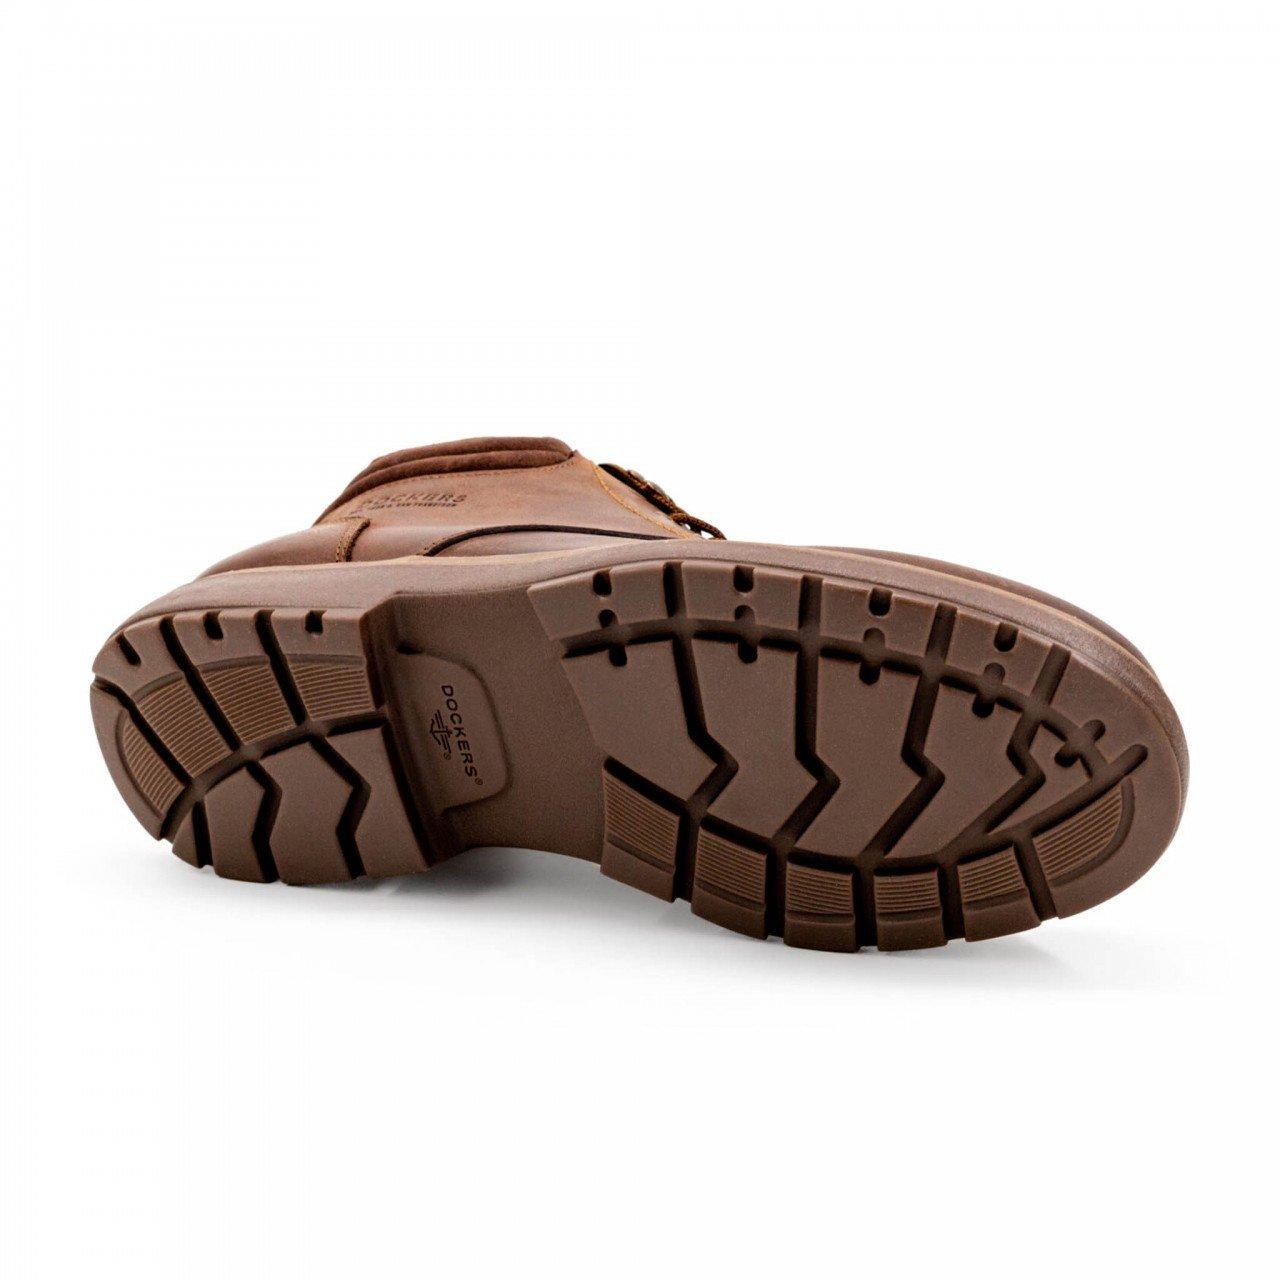 Bota café chocolate para hombre en piel Dockers 211711